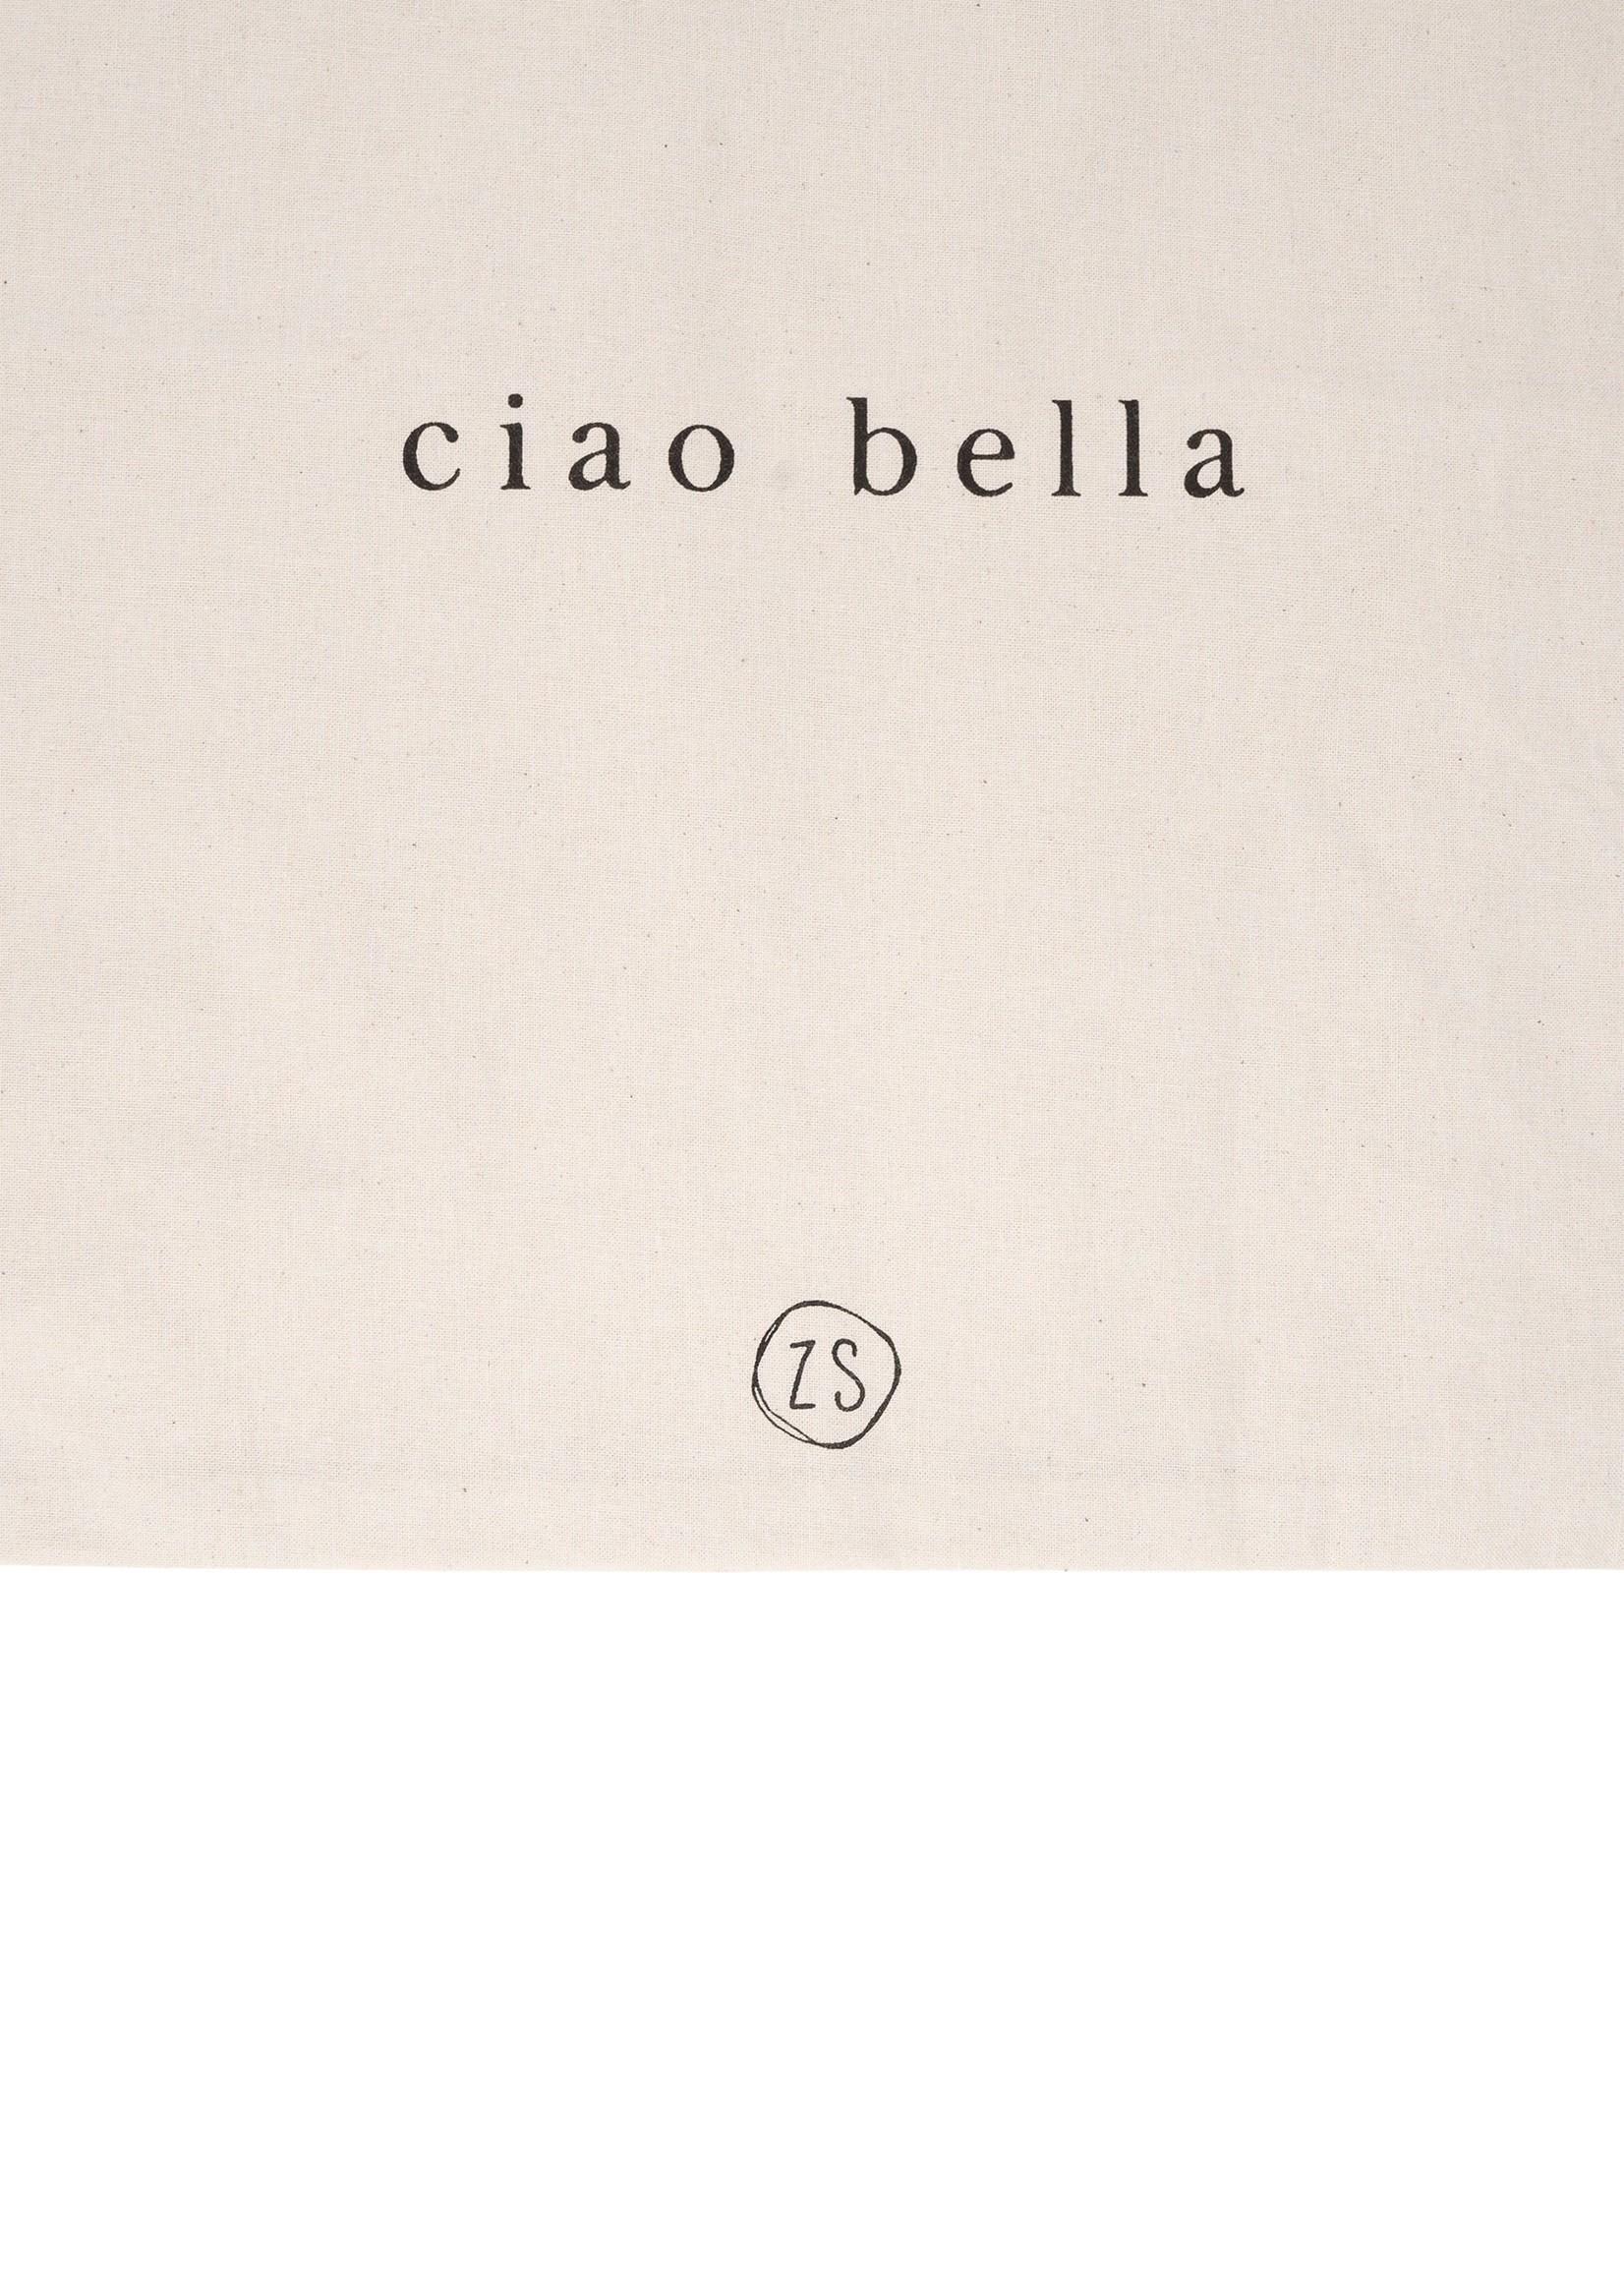 ZUSSS katoenen tasje ciao bella naturel